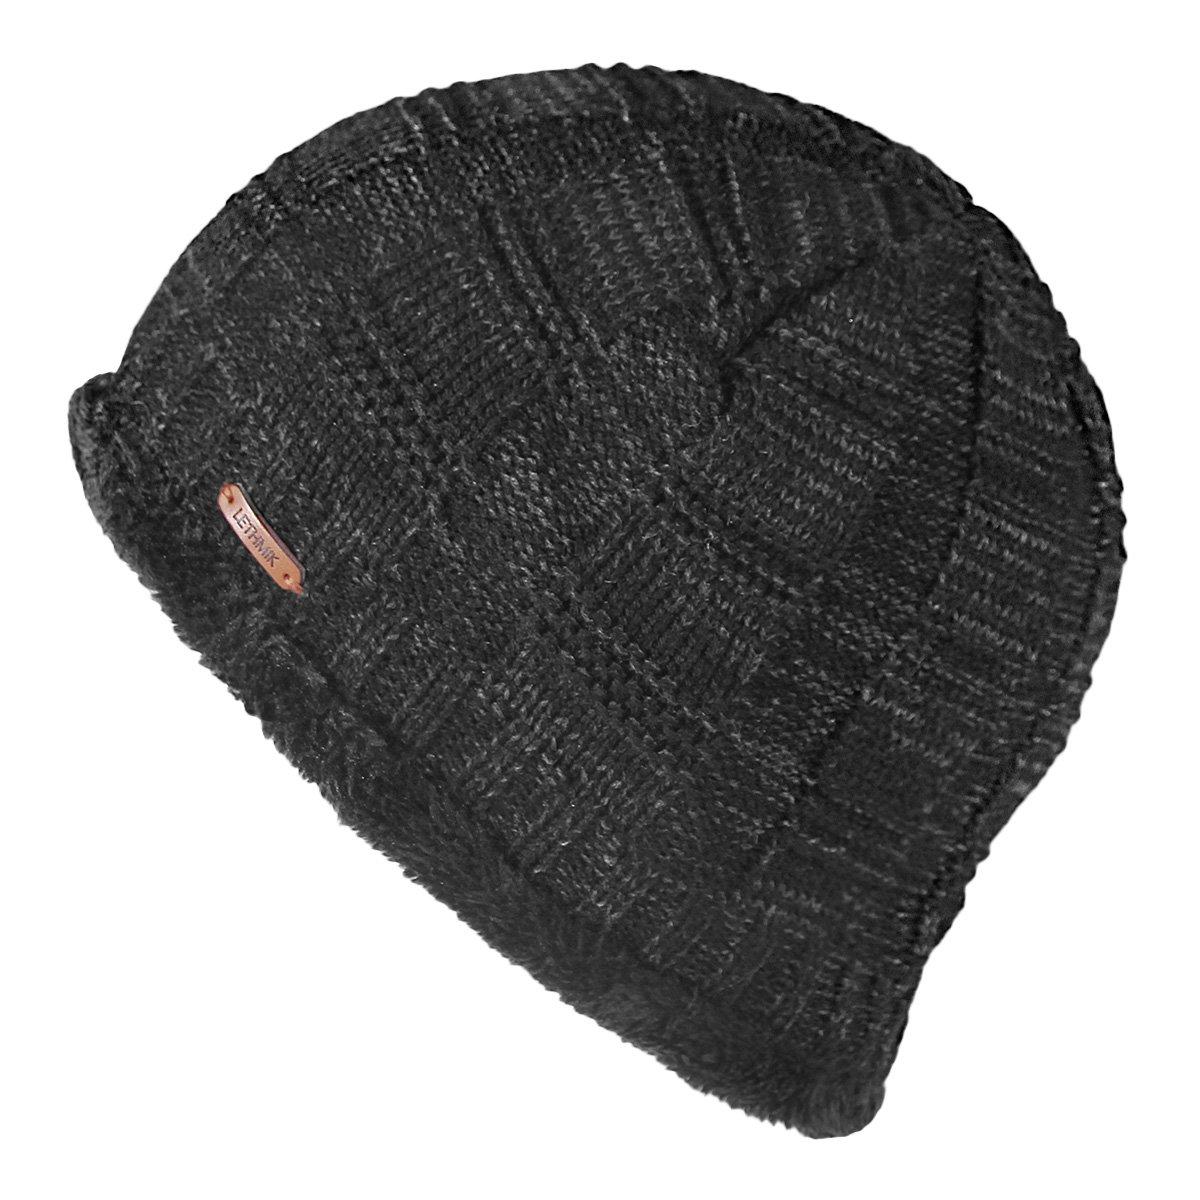 6fb2759d9 LETHMIK Unique Ribbed Knit Beanie Warm Thick Fleece Lined Hat Mens Winter  Skull Cap